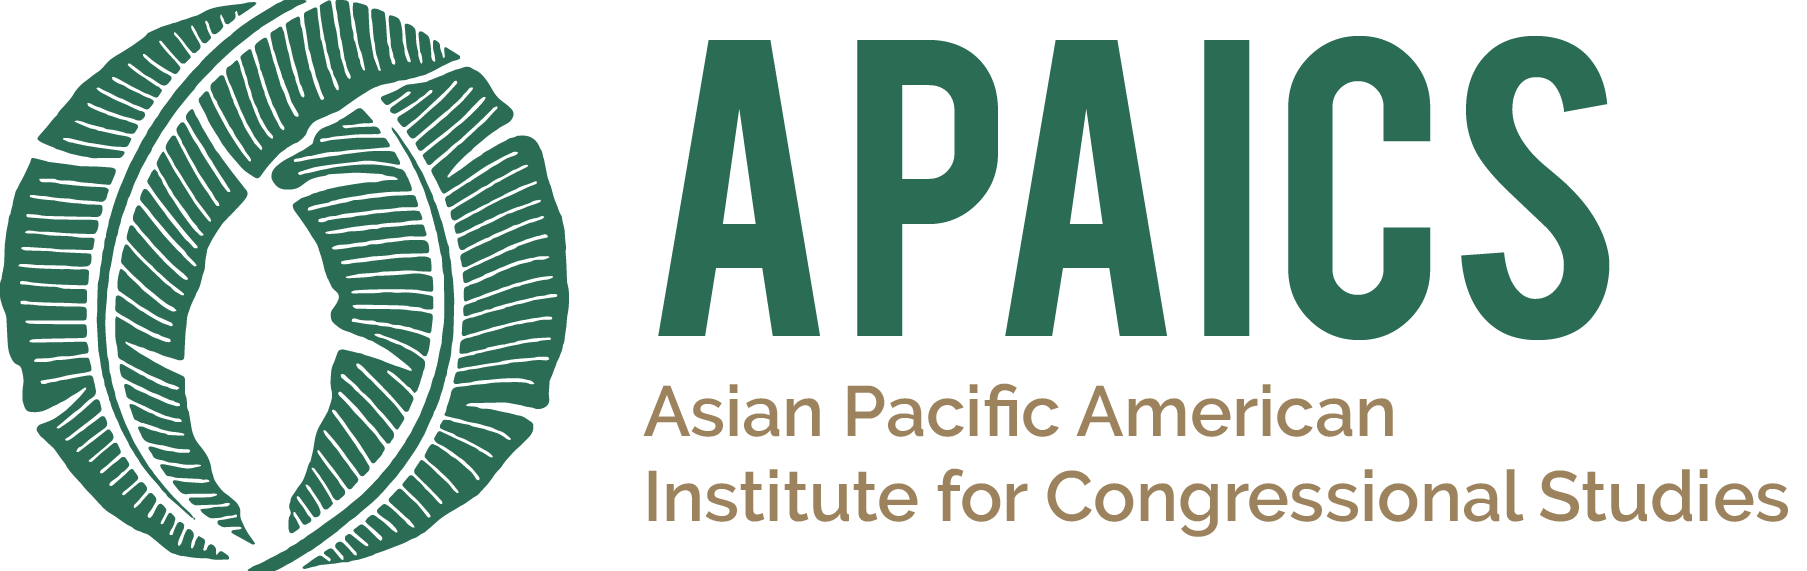 Asian Pacific American Institute for Congressional Studies logo